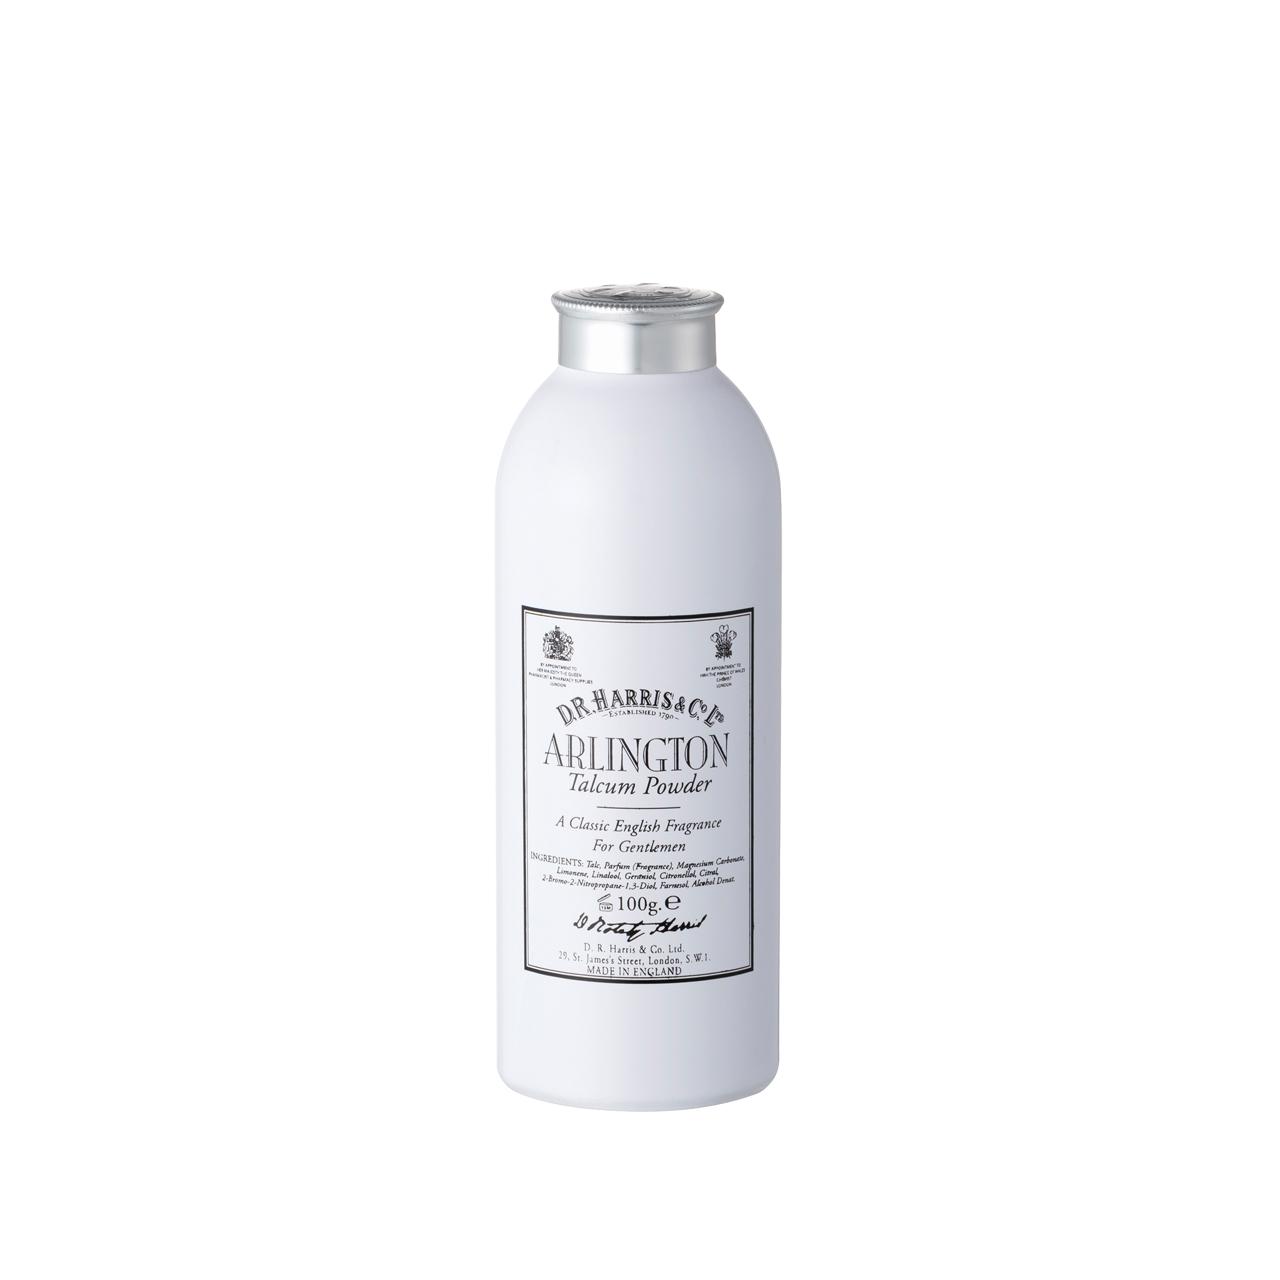 Arlington - Talcum Powder